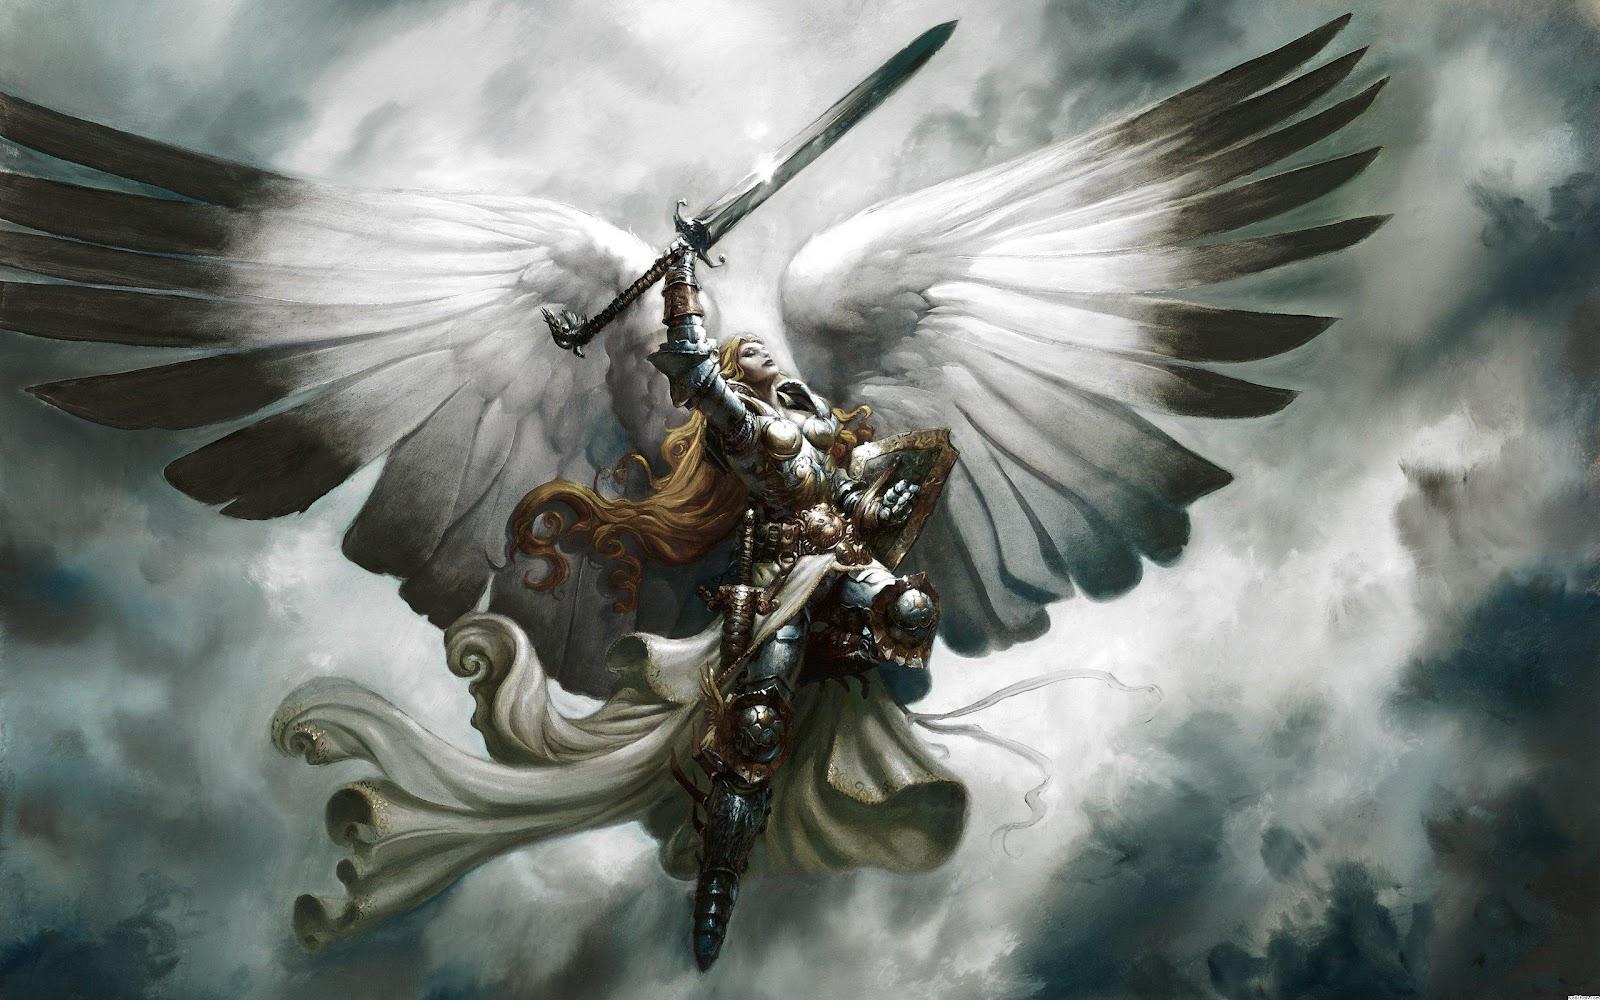 Amazing   Wallpaper Horse Magic - angel-magic-the-gathering-wallpaper  Pictures_228511.jpg